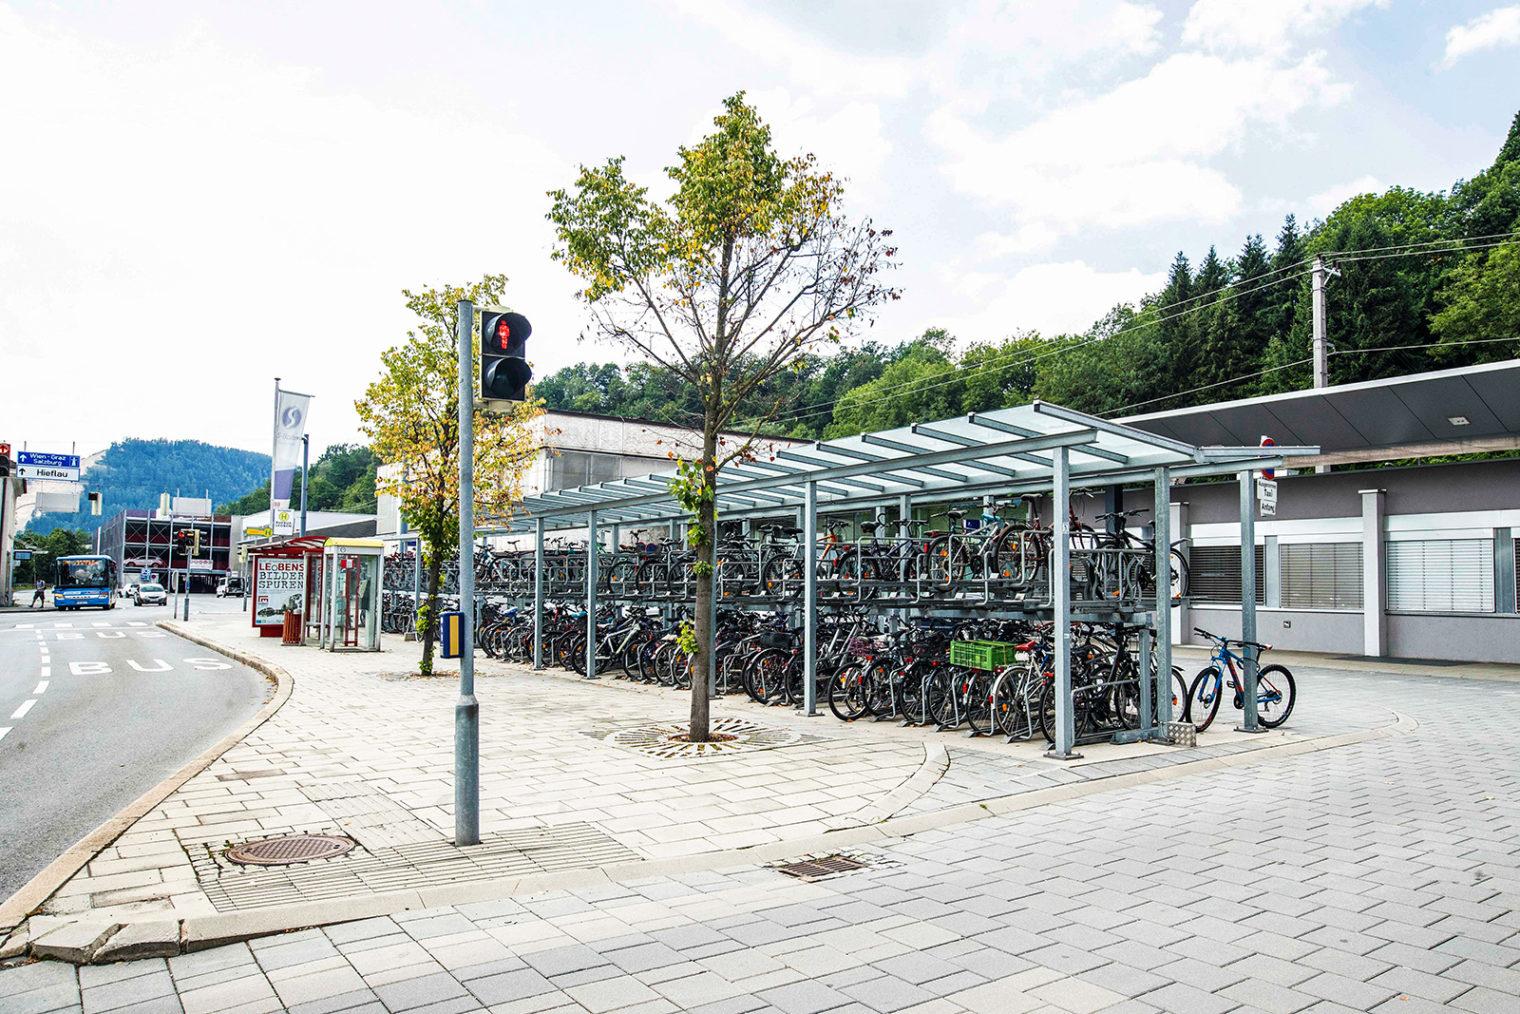 Bahnhof Leoben Fahrradabstellplätze